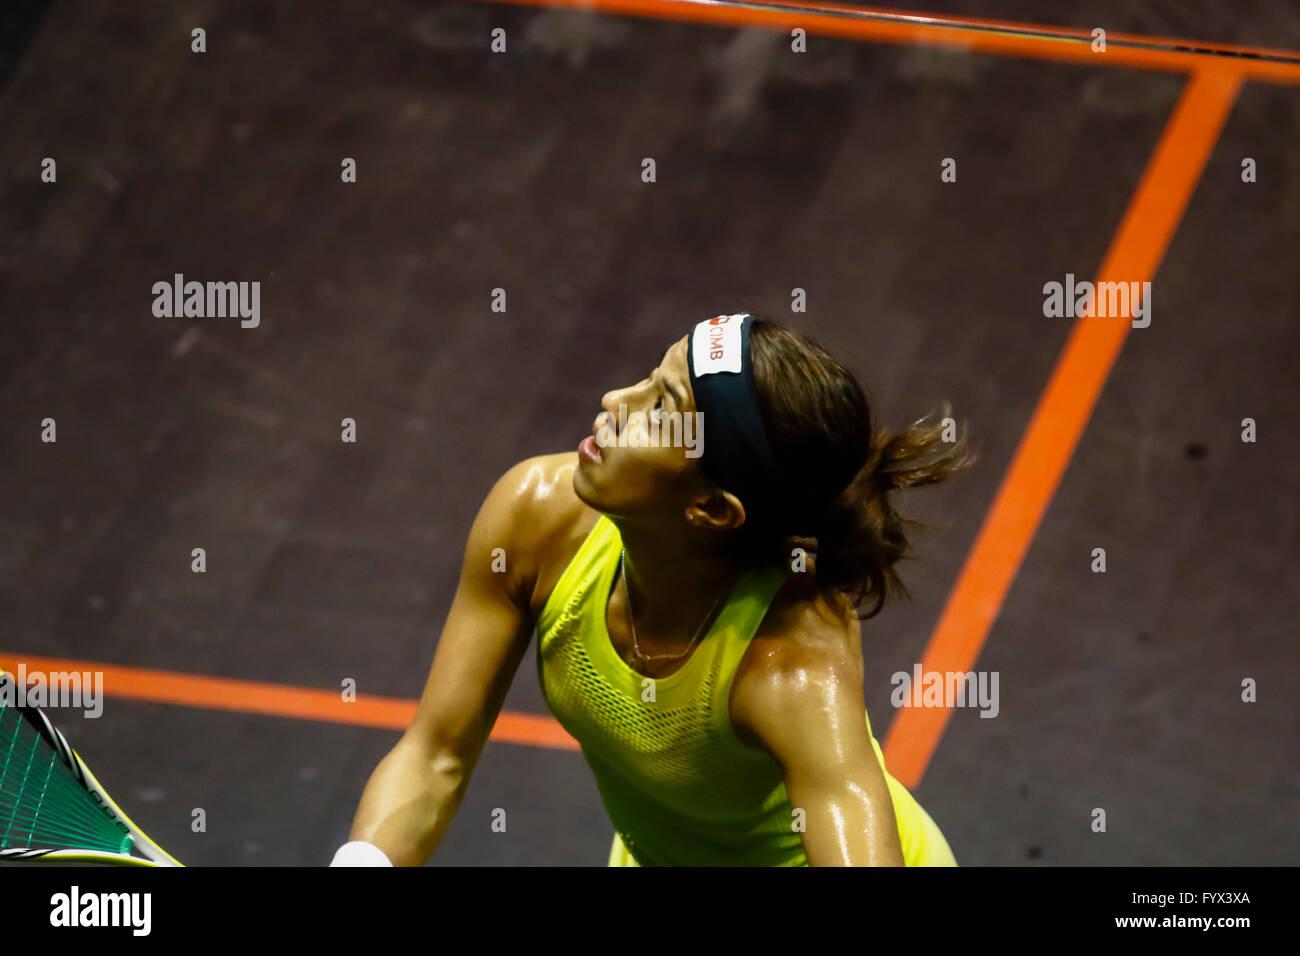 Kuala Lumpur, Malaysia. 28th Apr, 2016. Nicol David running fast to return a shot at Women's World Championships - Stock Image